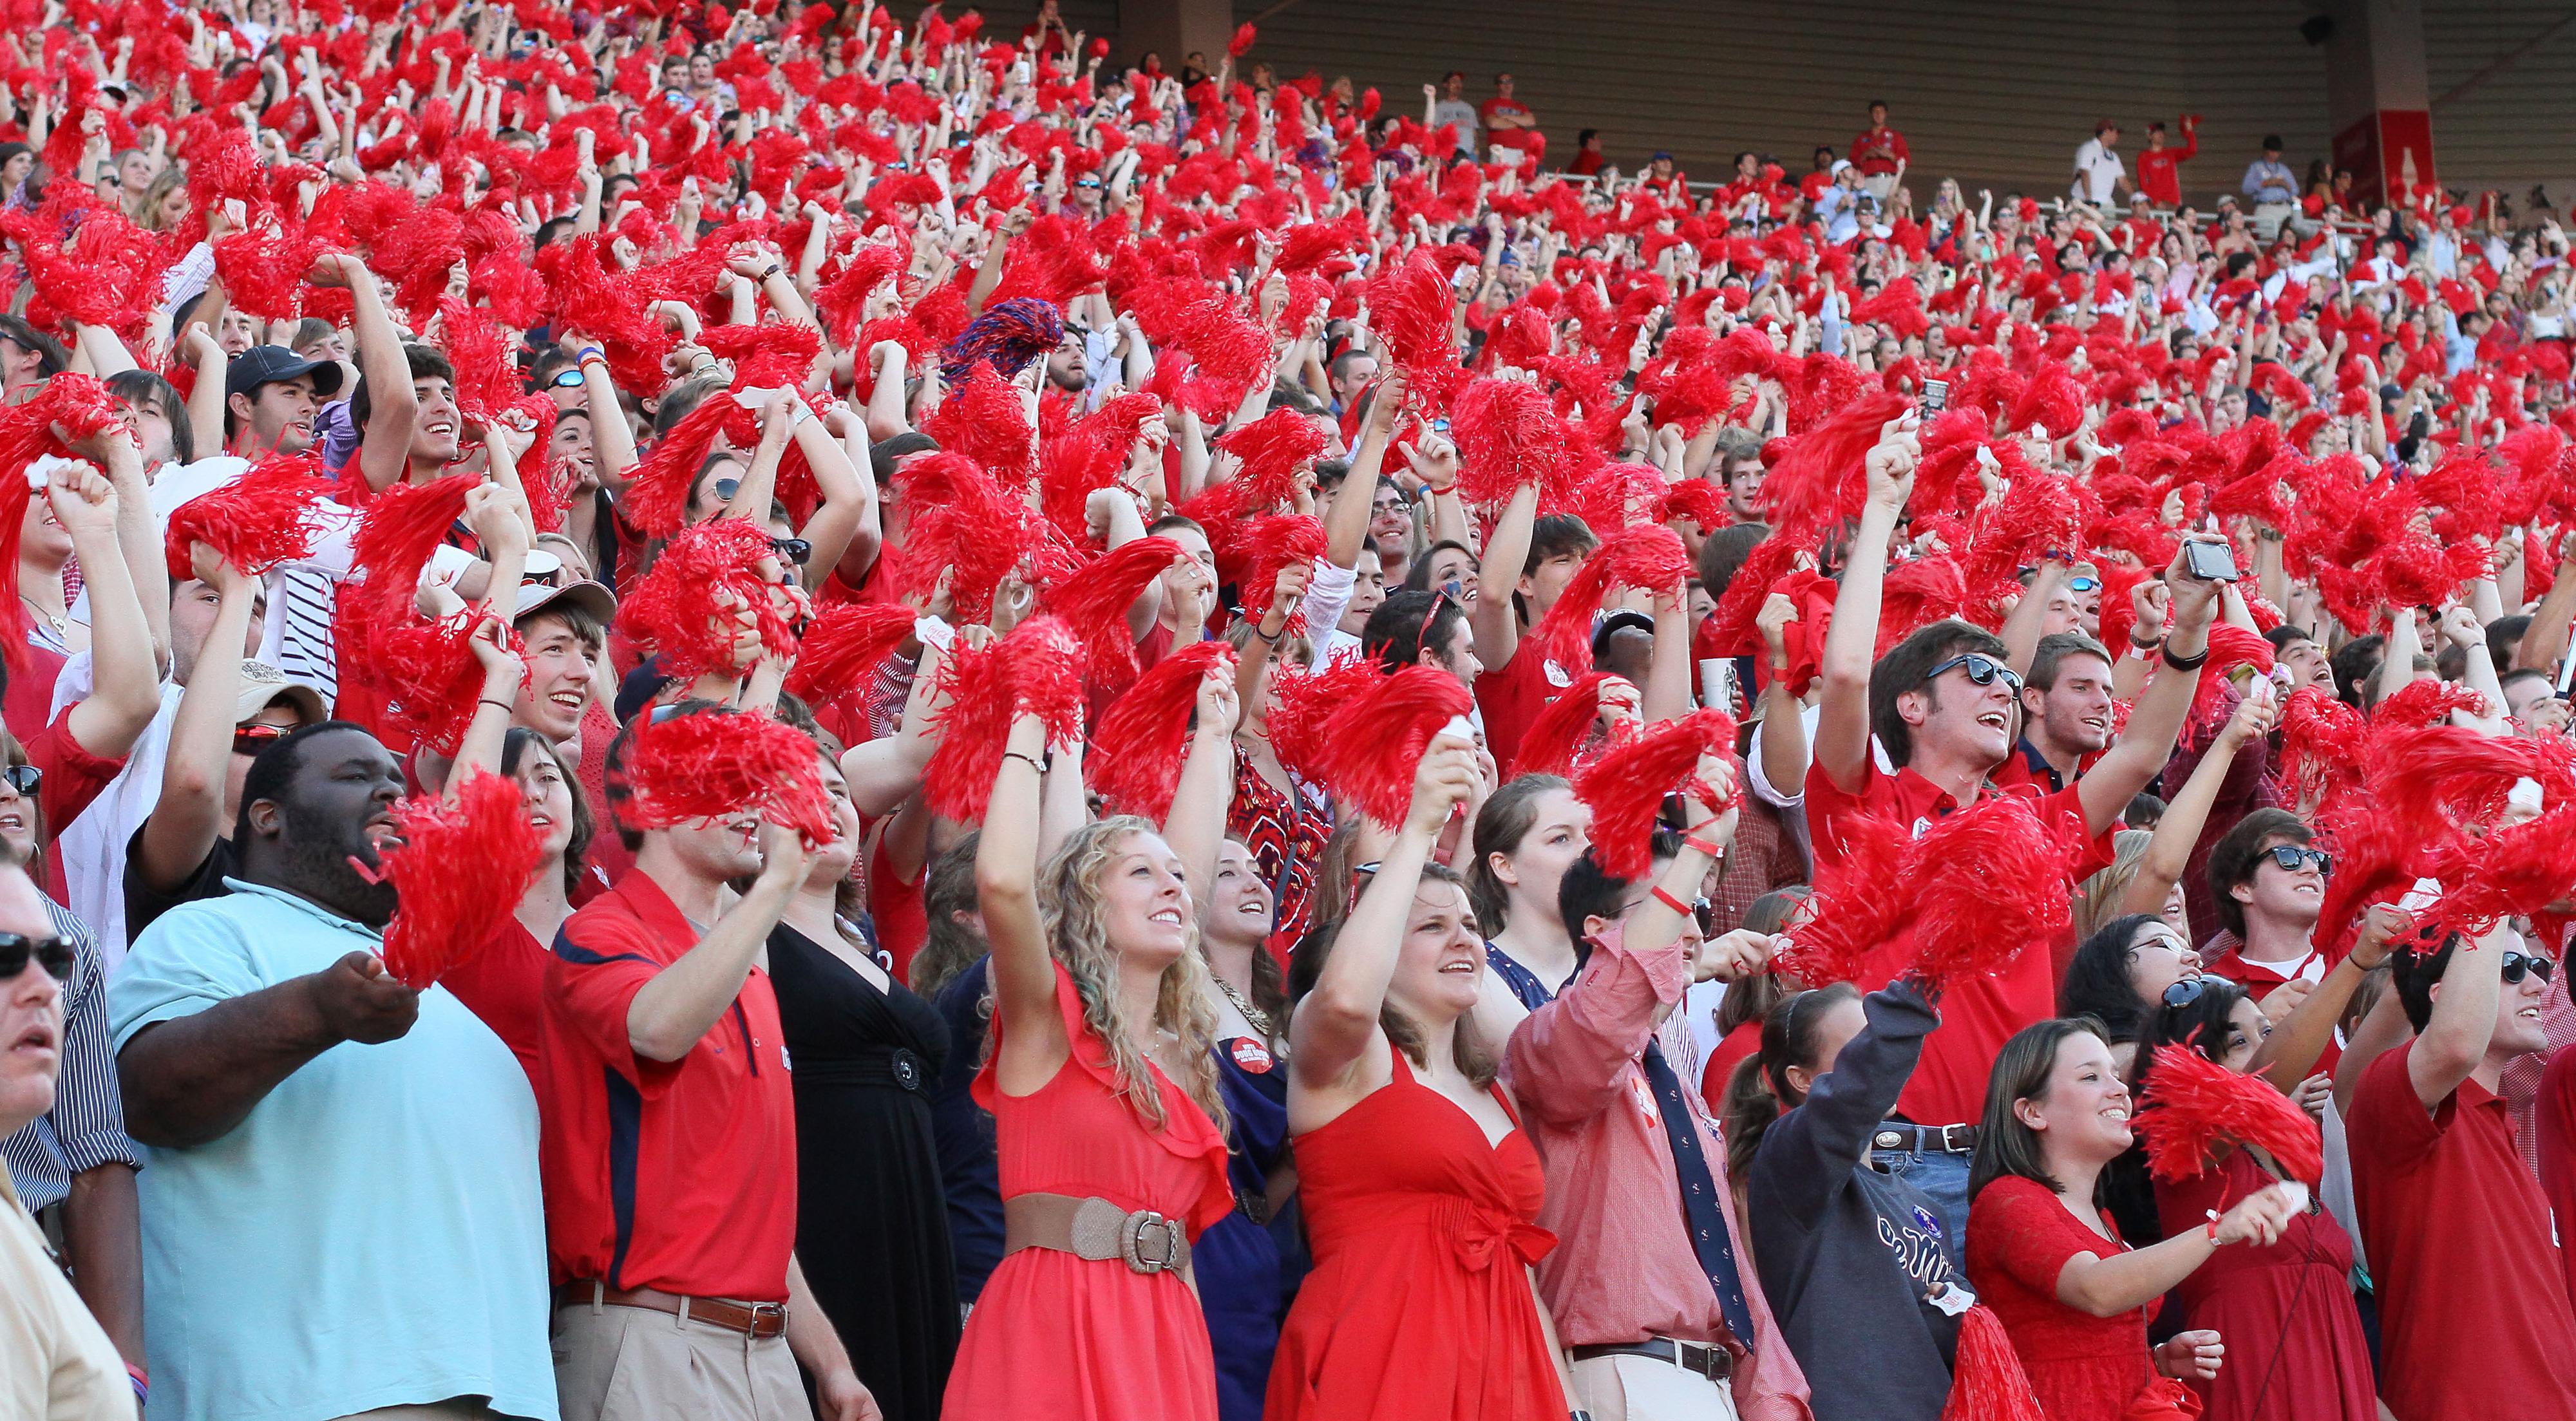 Nothing strikes fear in a Texan like a bumpkin waving a pom-pom.